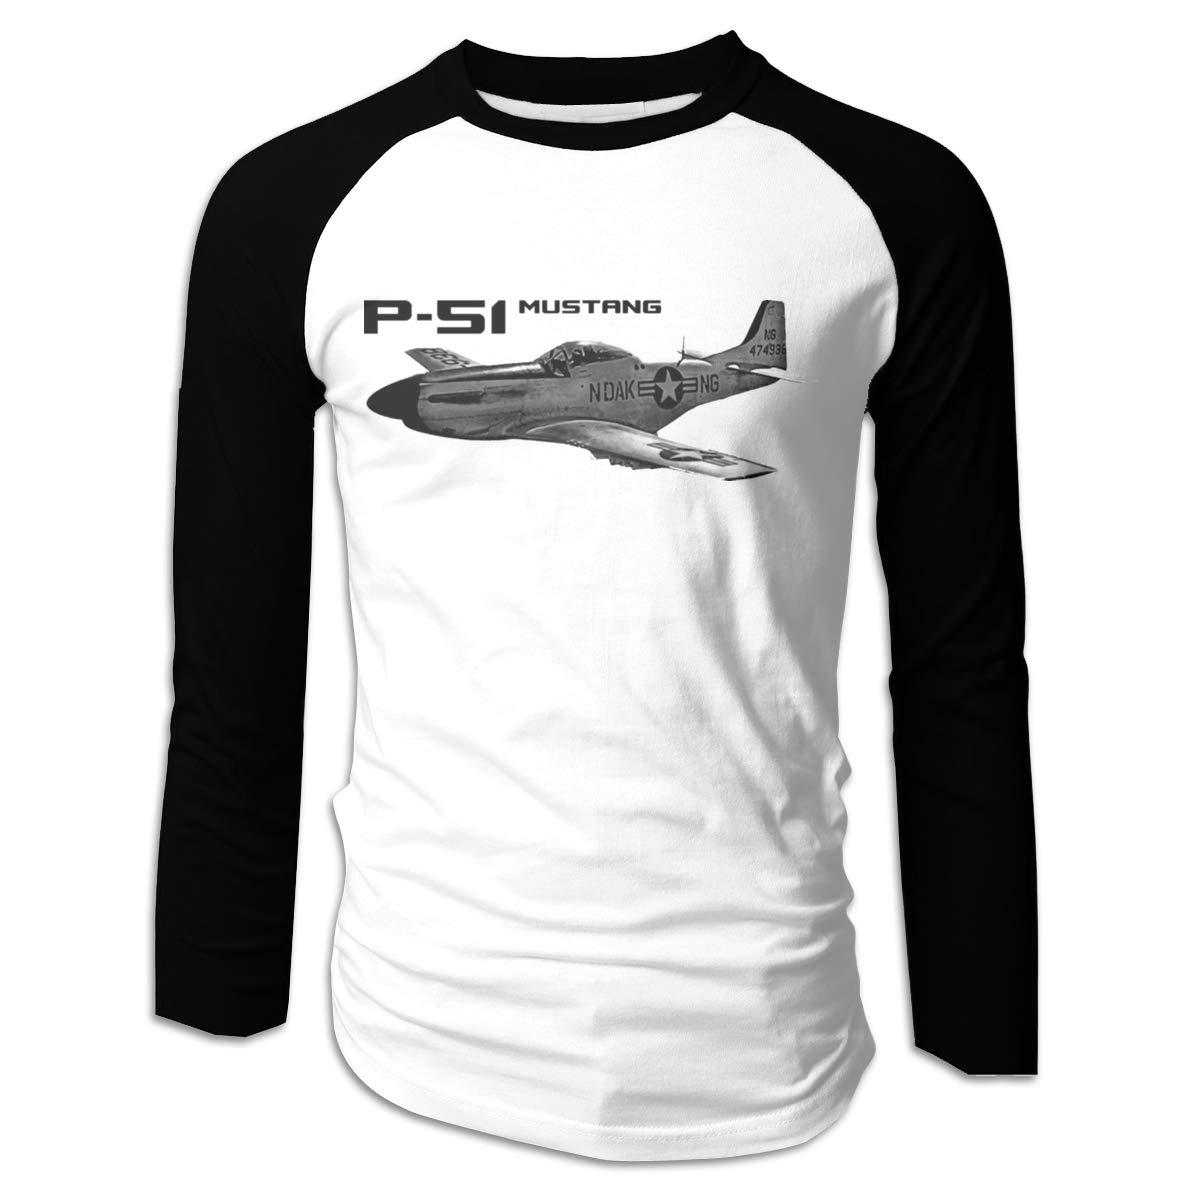 Wumayouly Men's P-51 Mustang Fashion Running Long Sleeve Raglan Shirt Black